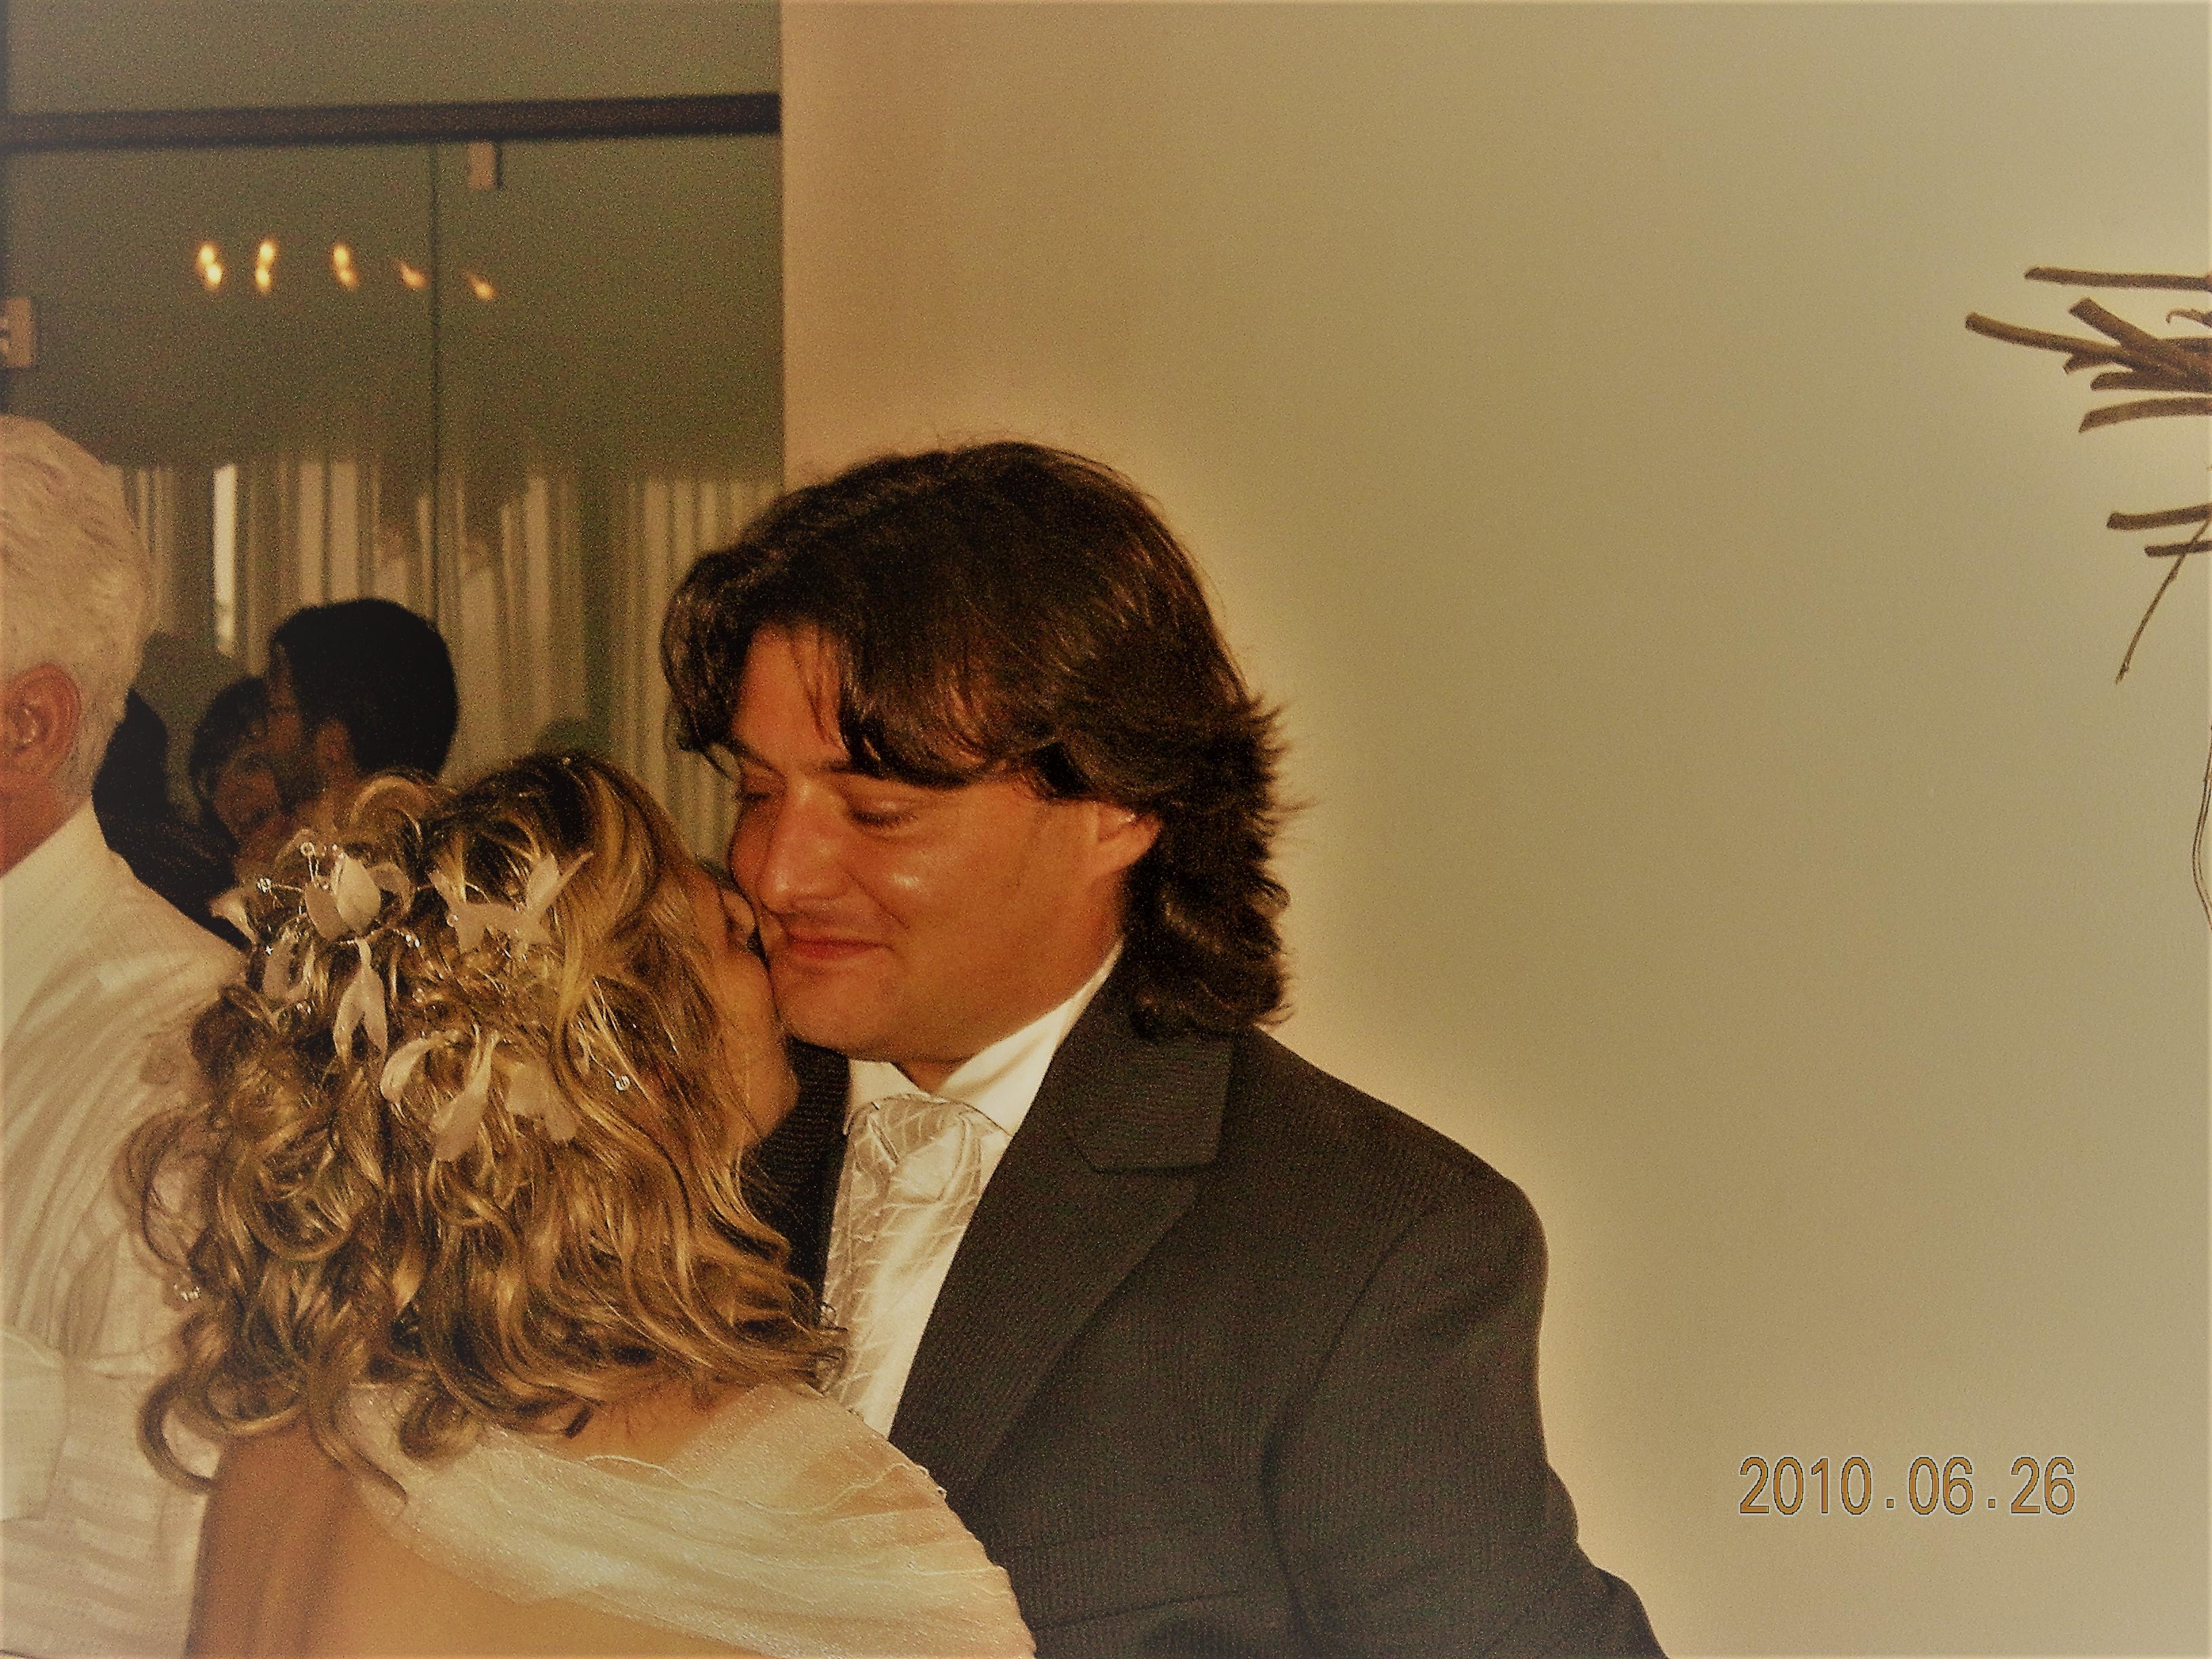 Francesco e Rosanna - 26.06.2010 - 011.JPG